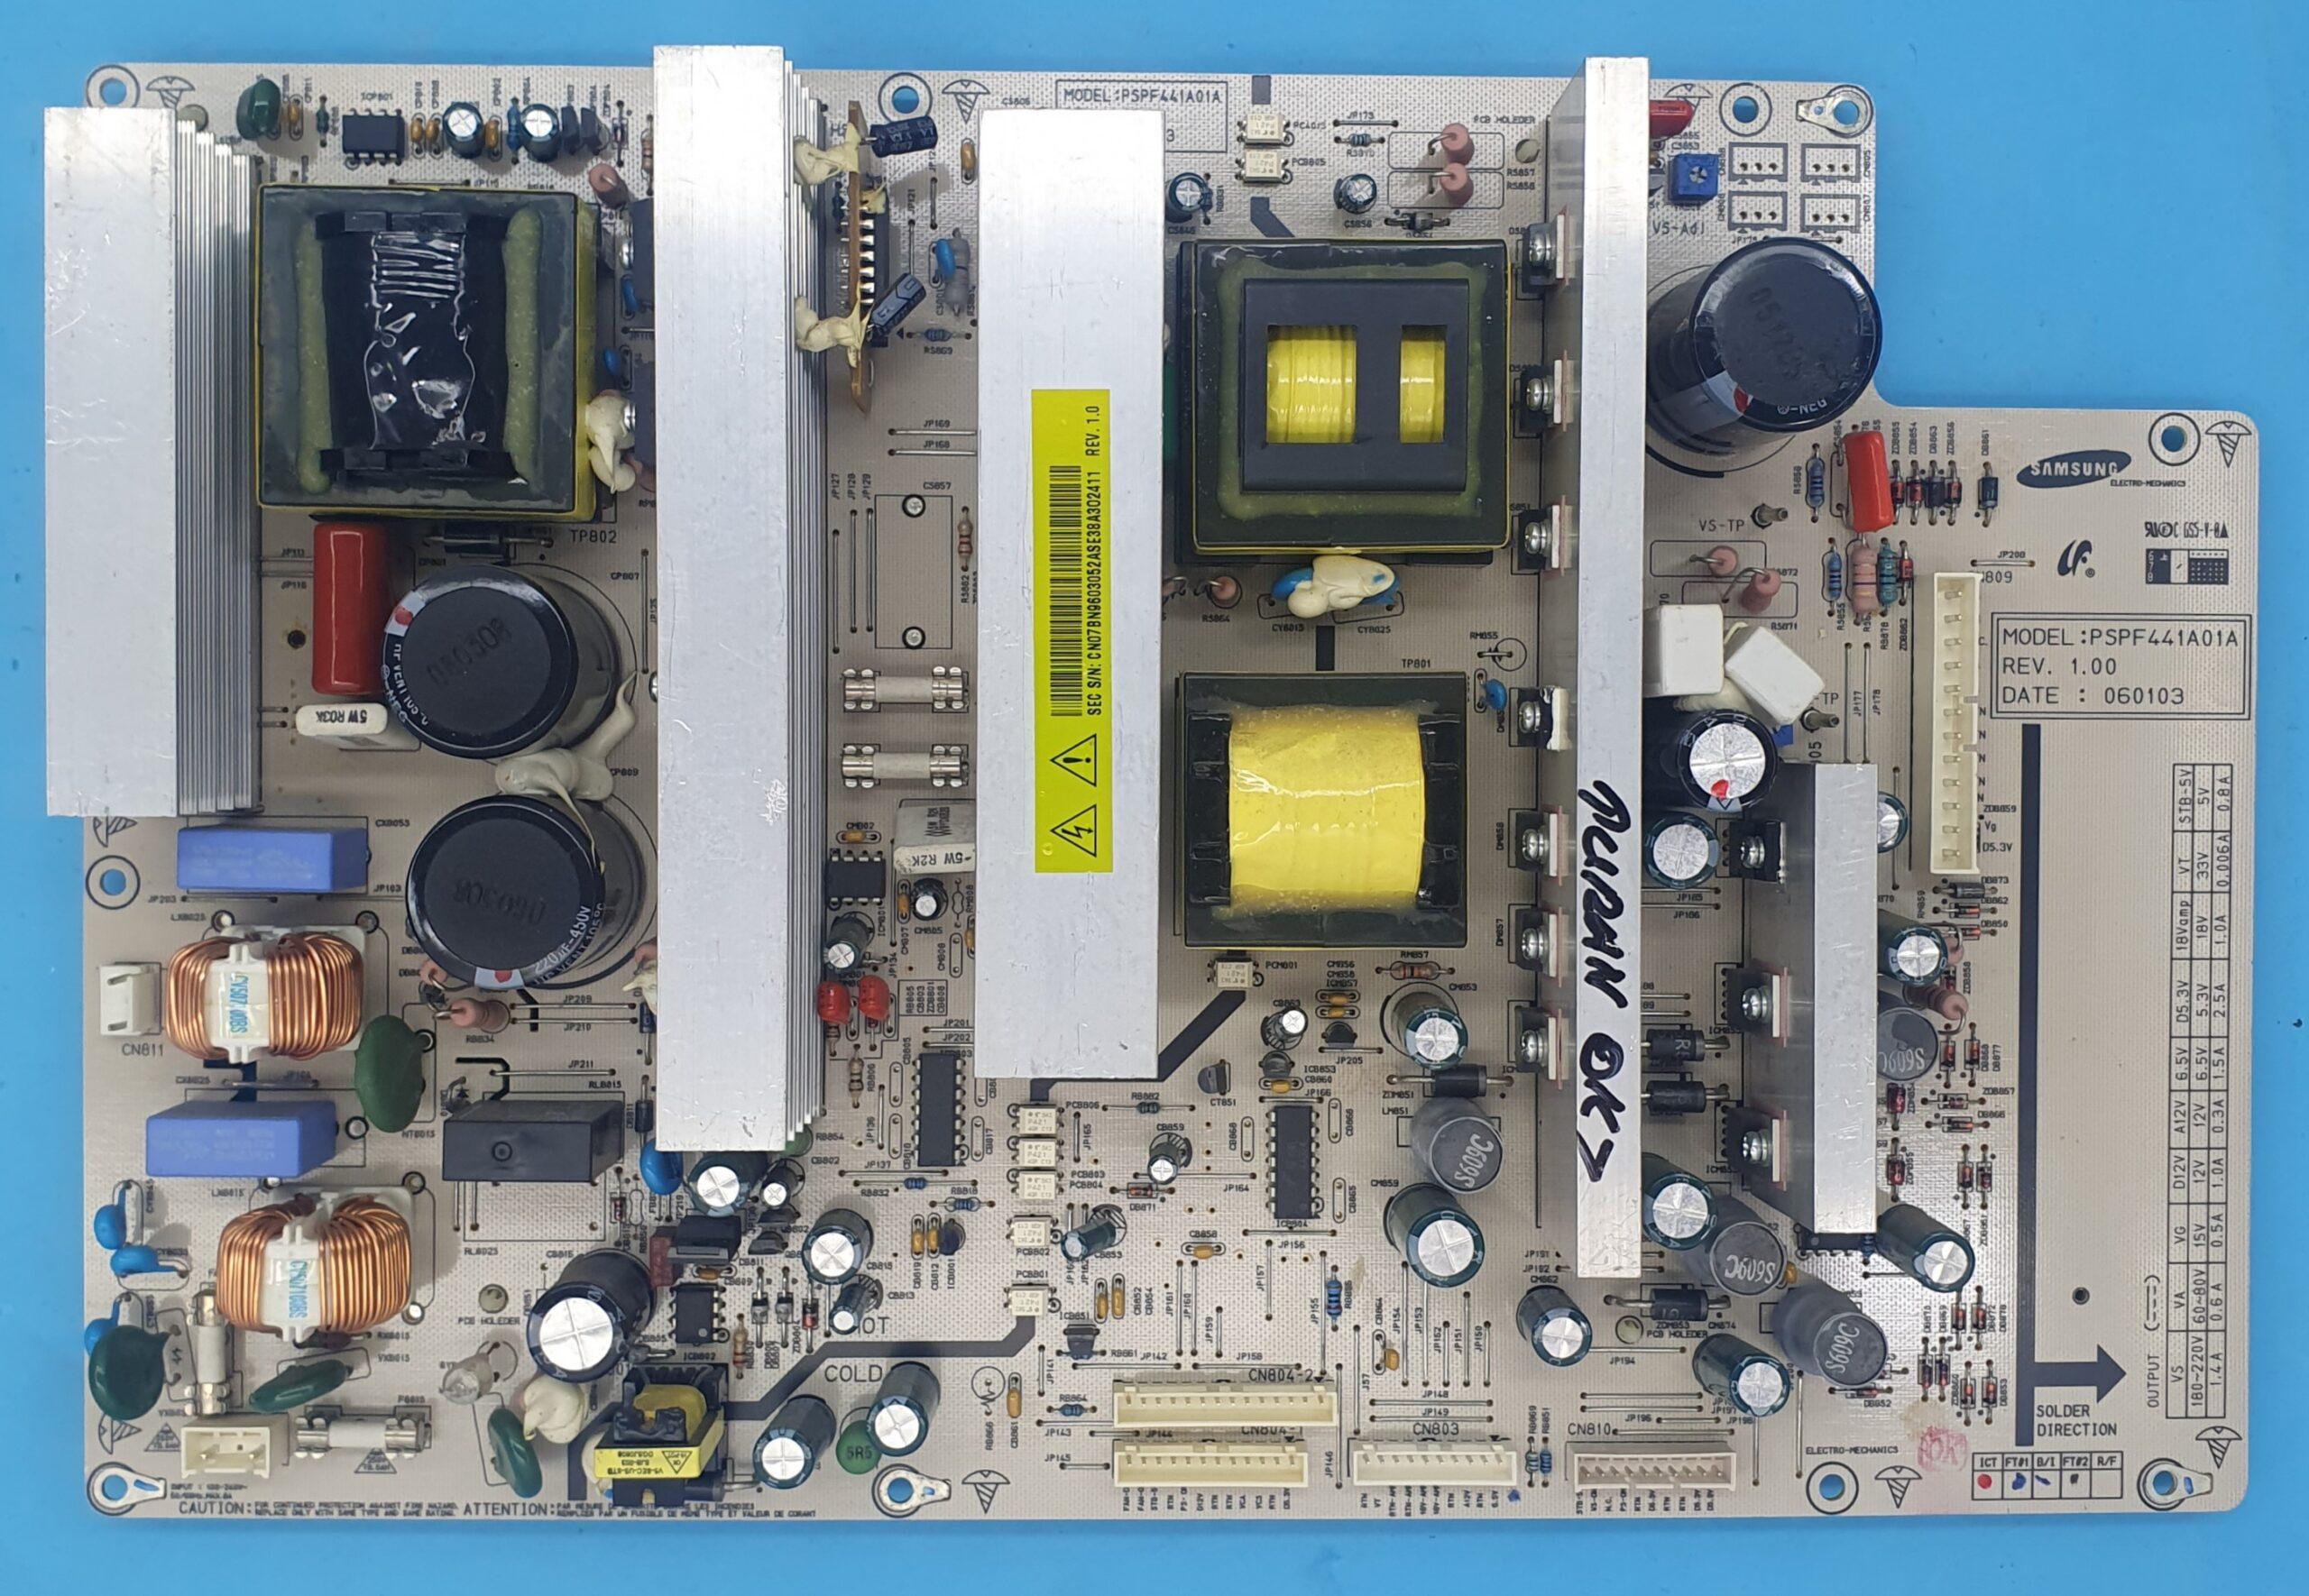 PSPF441A01A Samsung Power (KDV DAHİL = 200 TL)